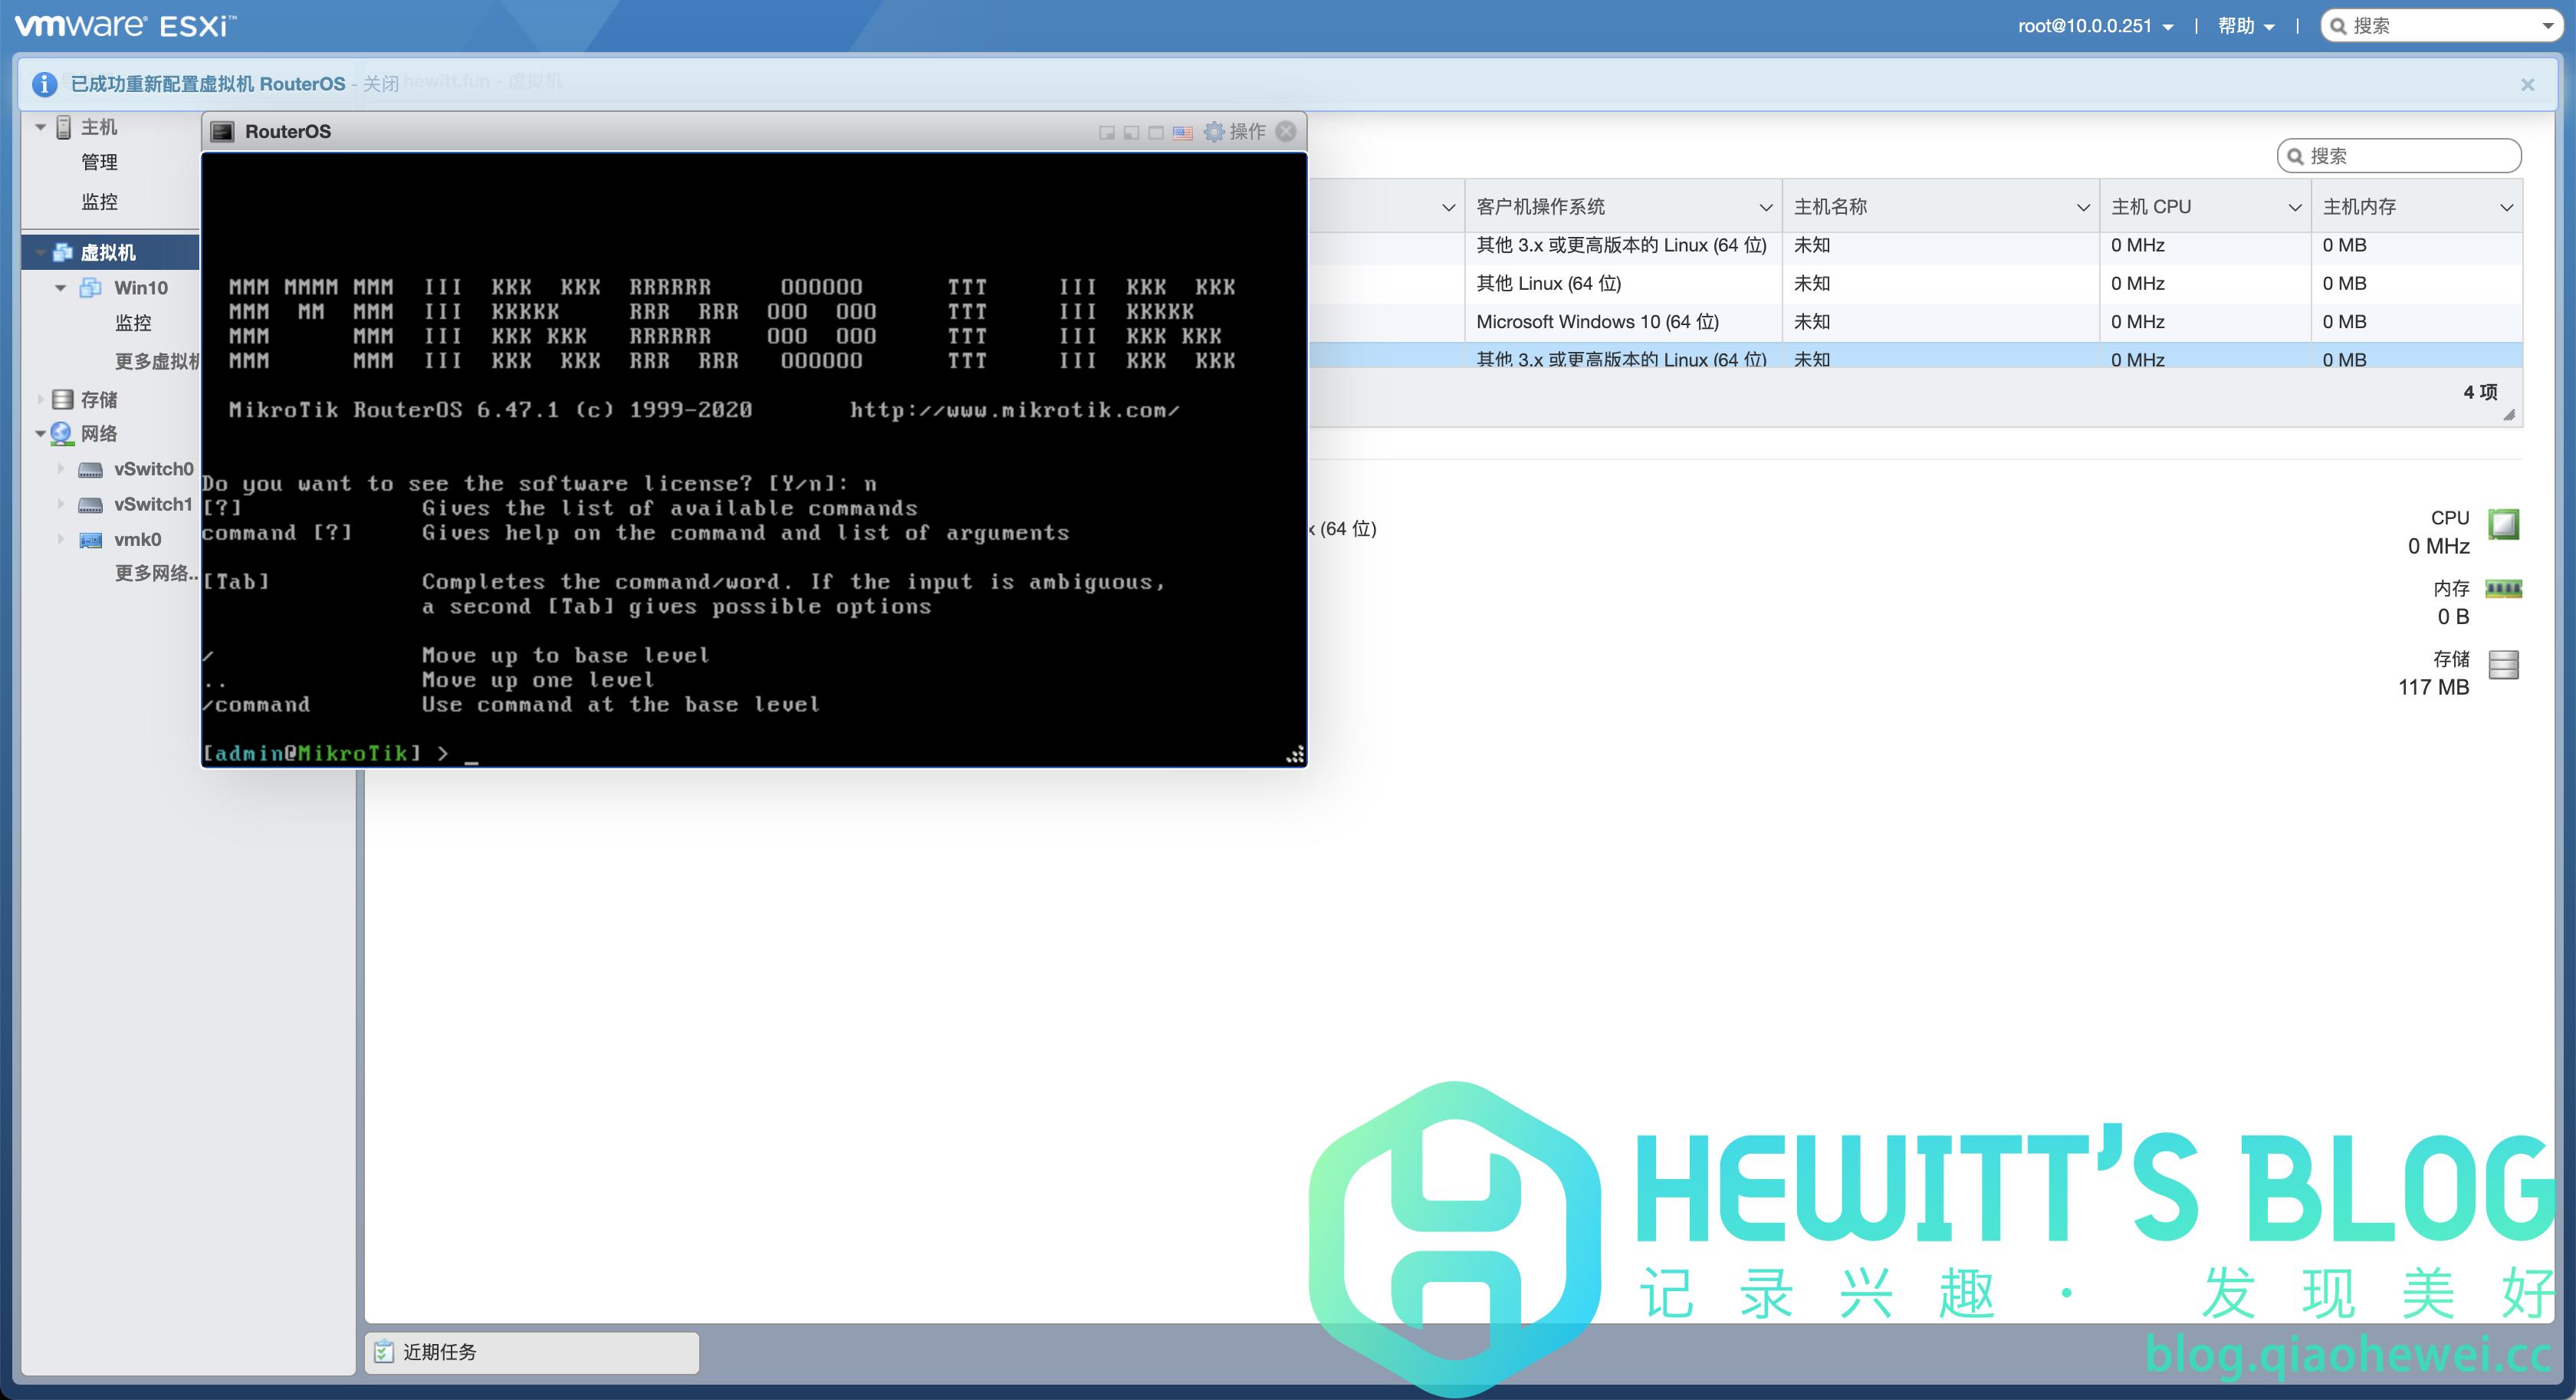 ESXI安装Mikrotik RouterOS(ROS)软路由部署指南(附授权镜像下载)插图29